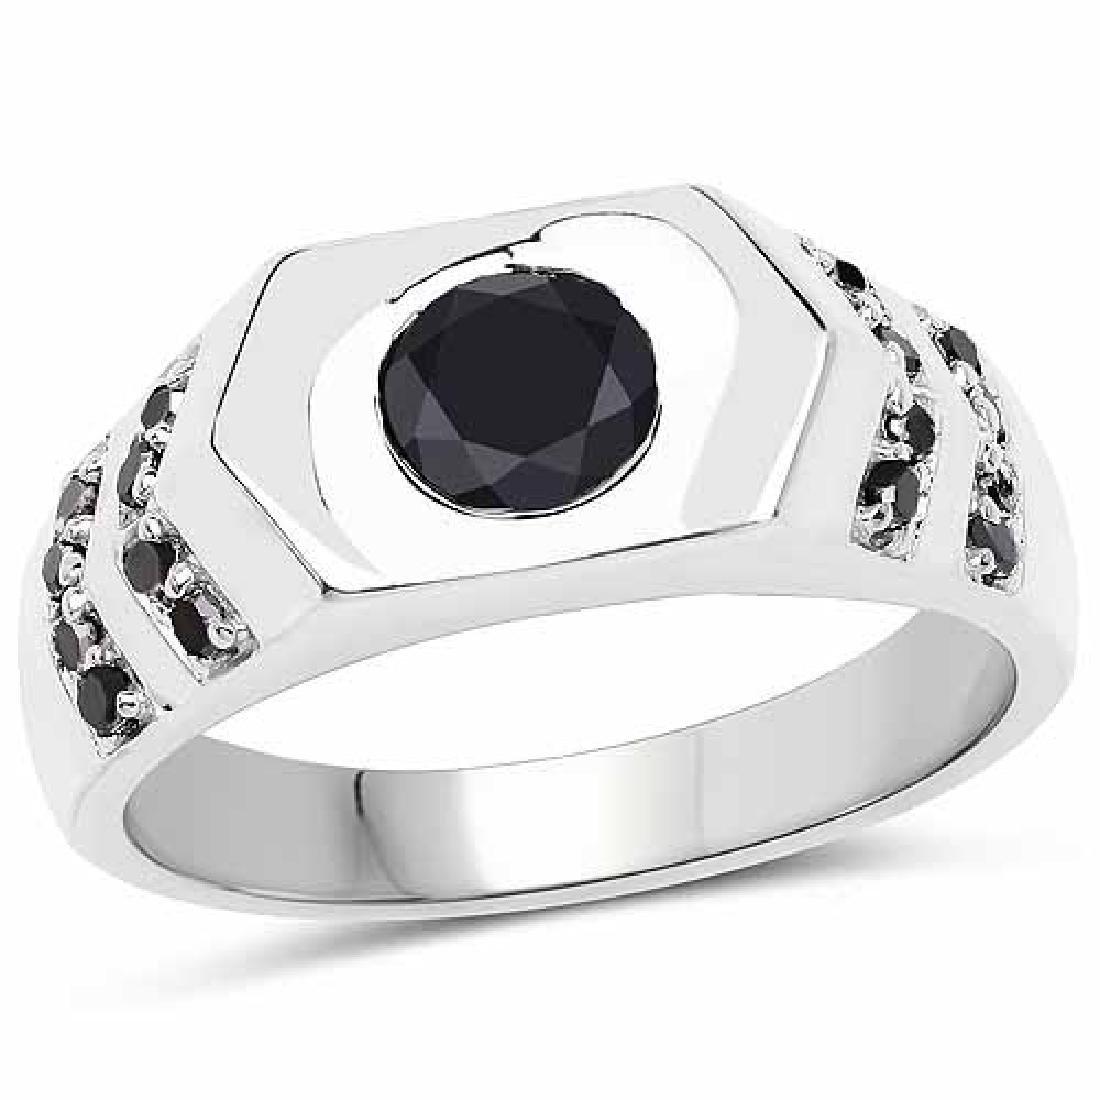 1.53 Carat Genuine Black Diamond .925 Sterling Silver R